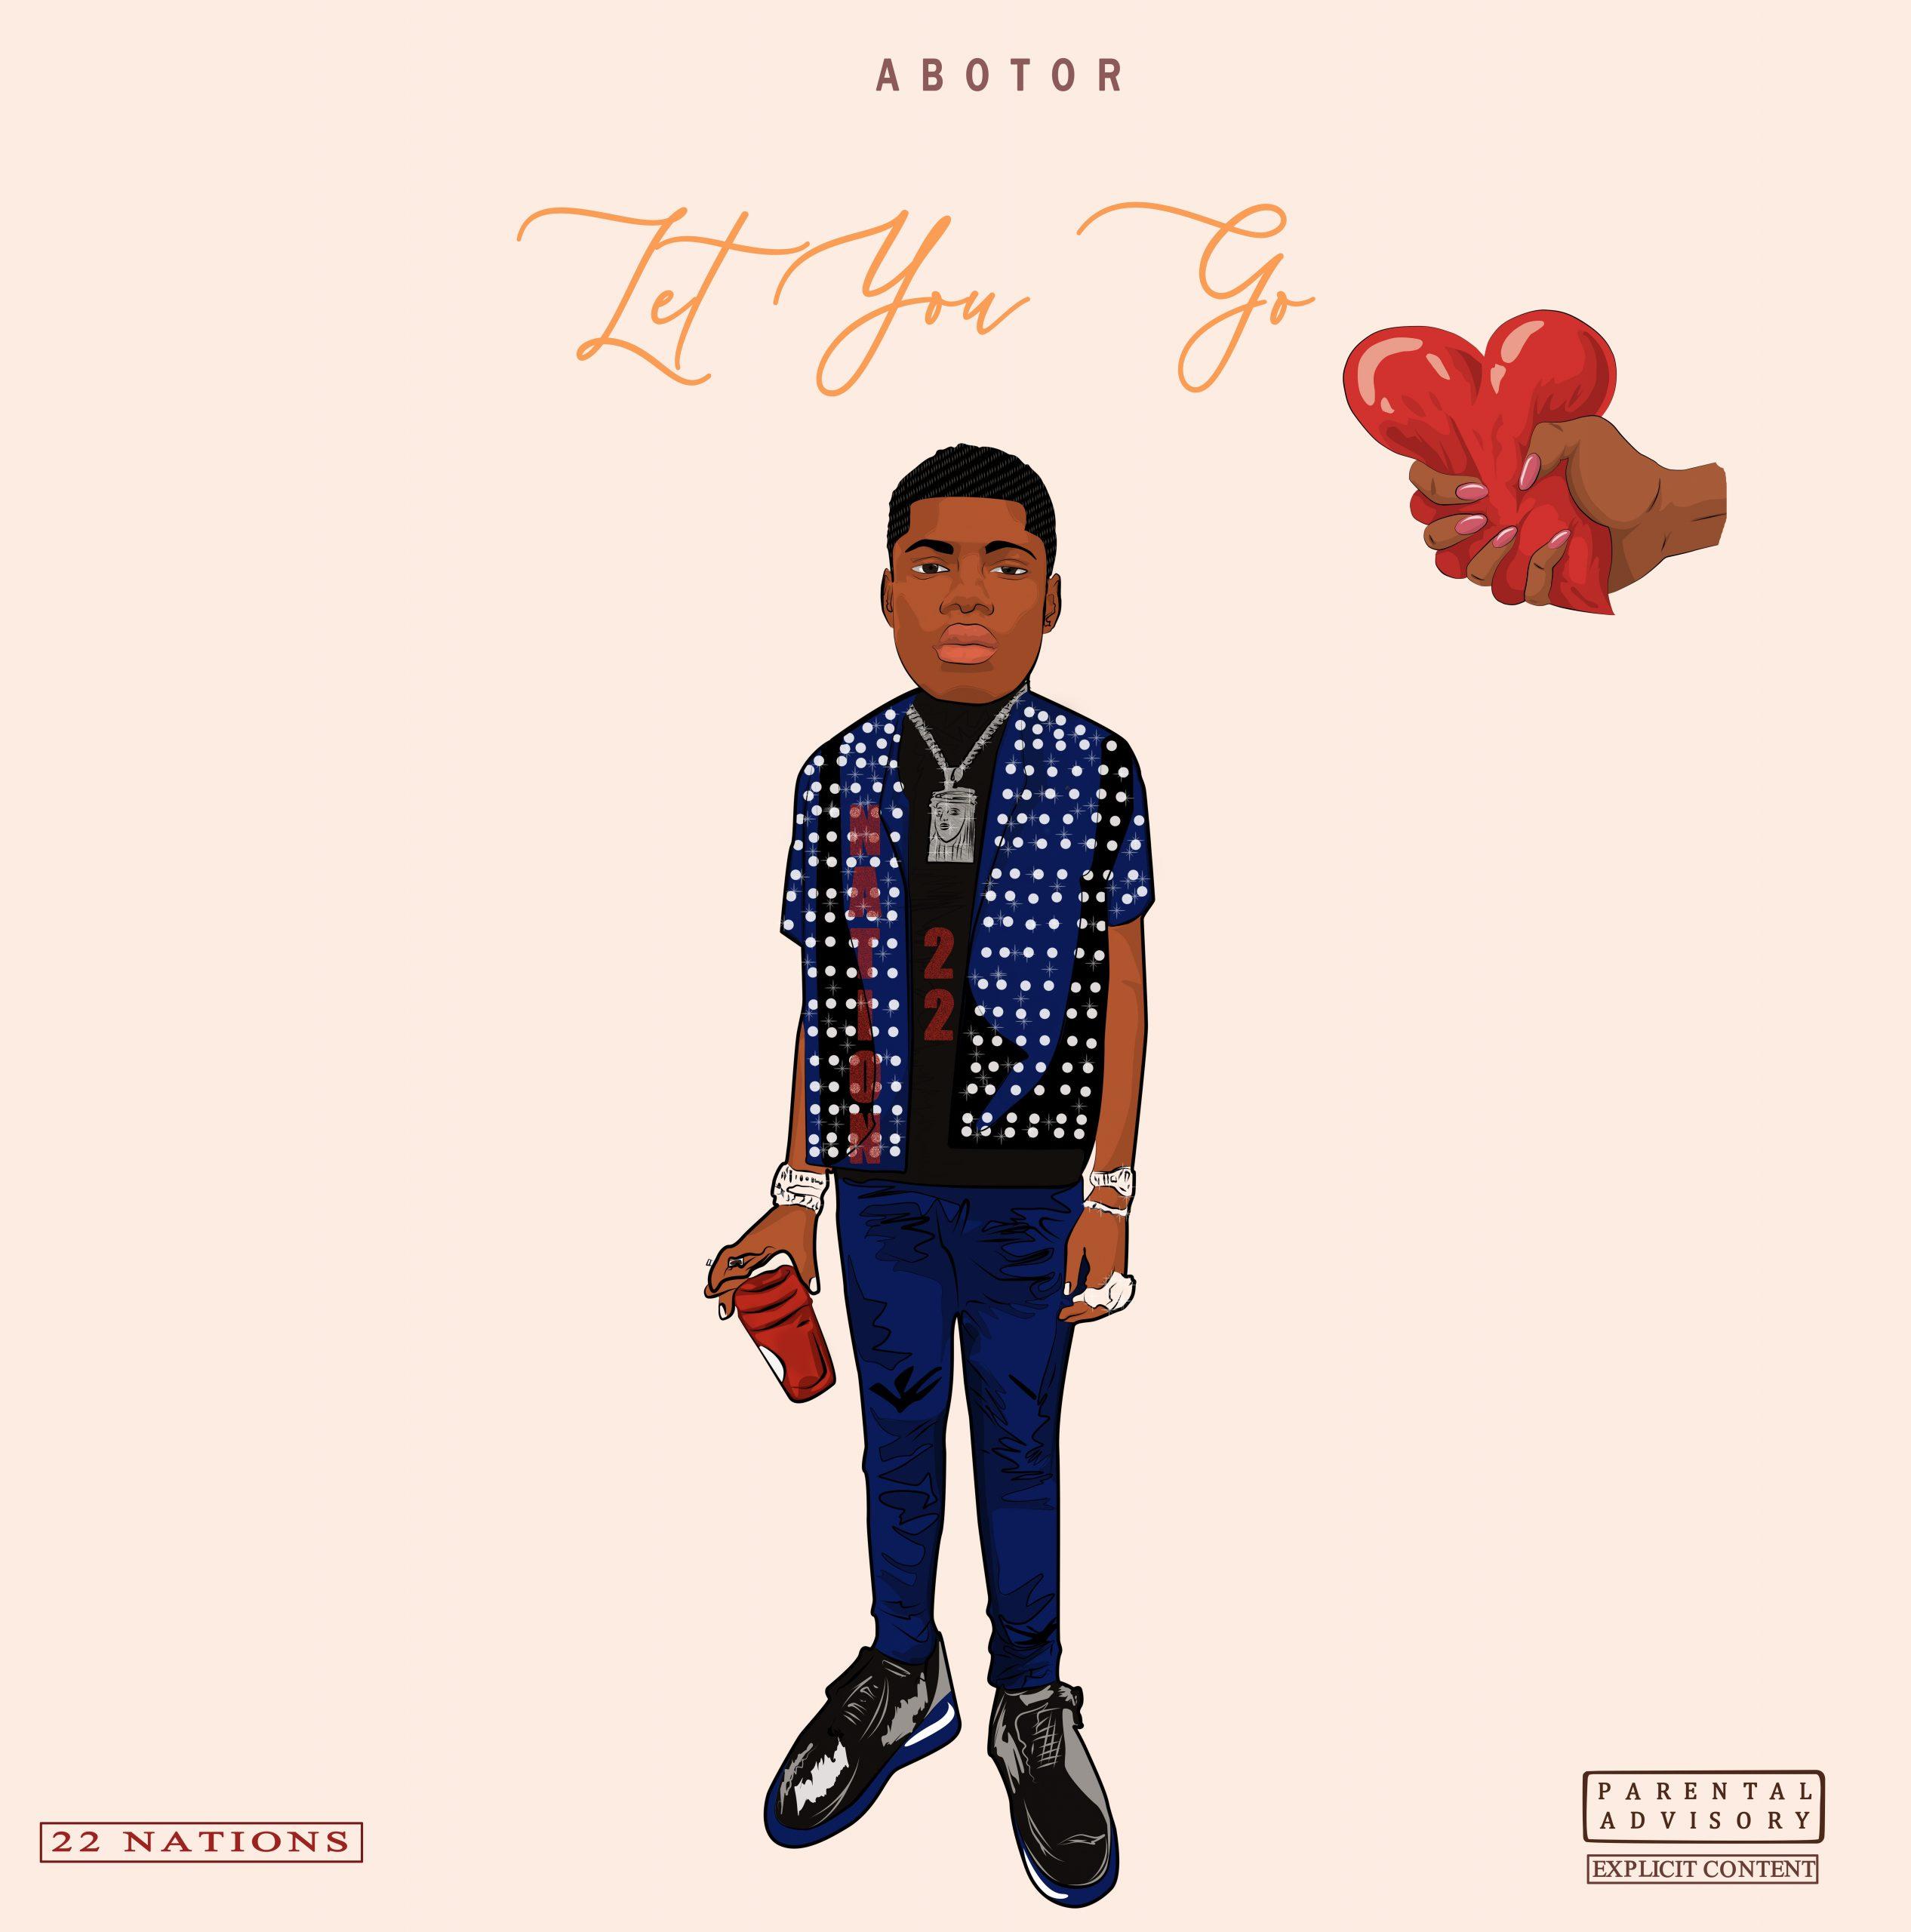 Abotor - Let You Go